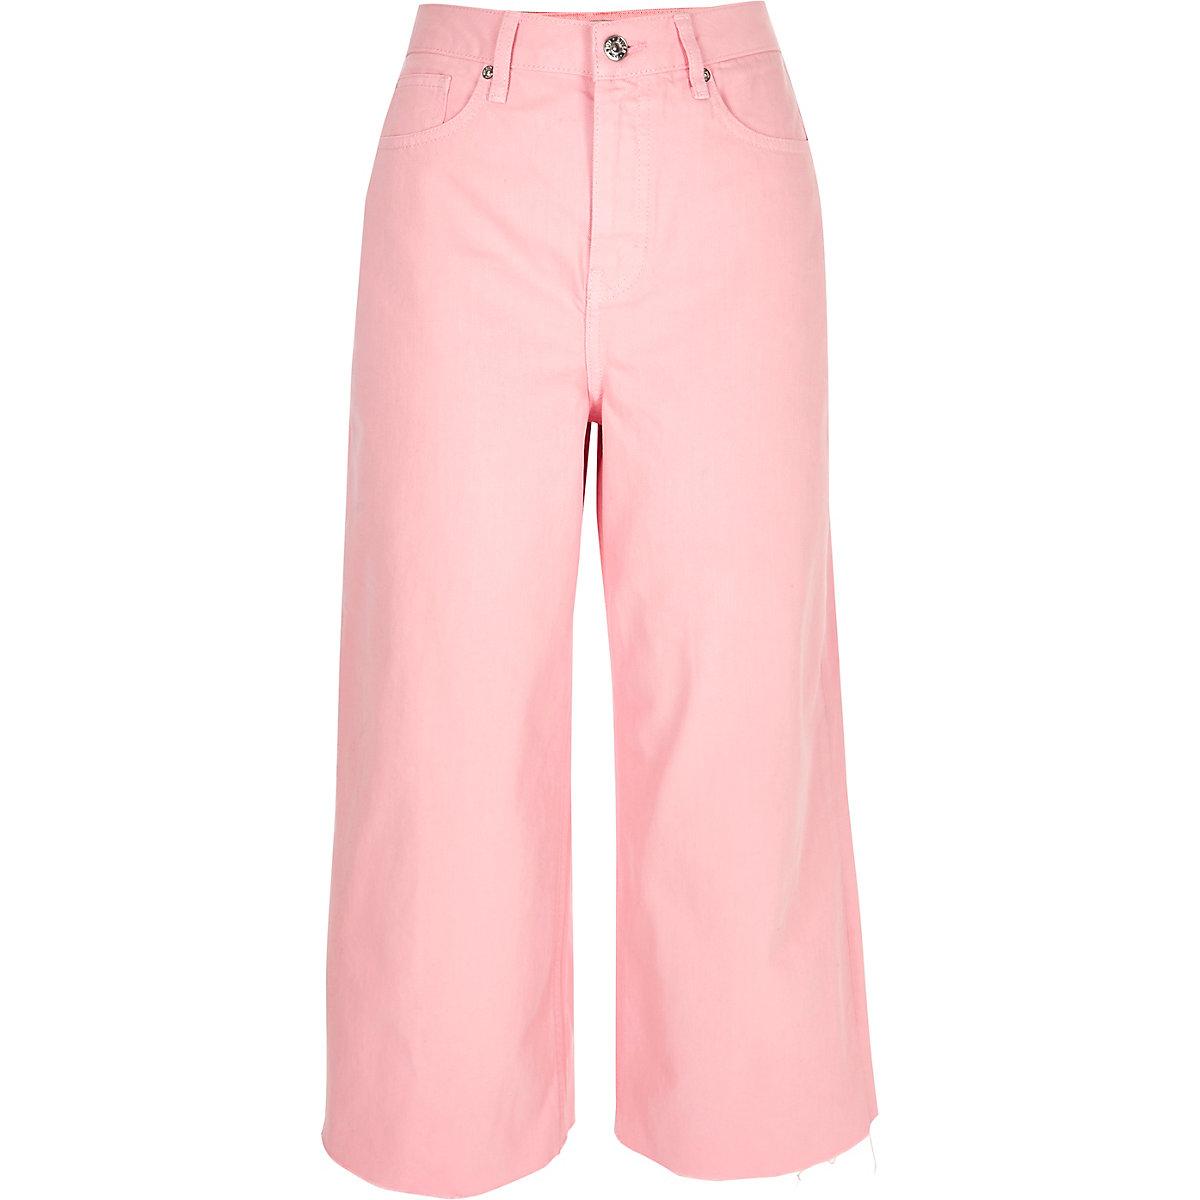 Pink Alexa cropped wide leg jeans